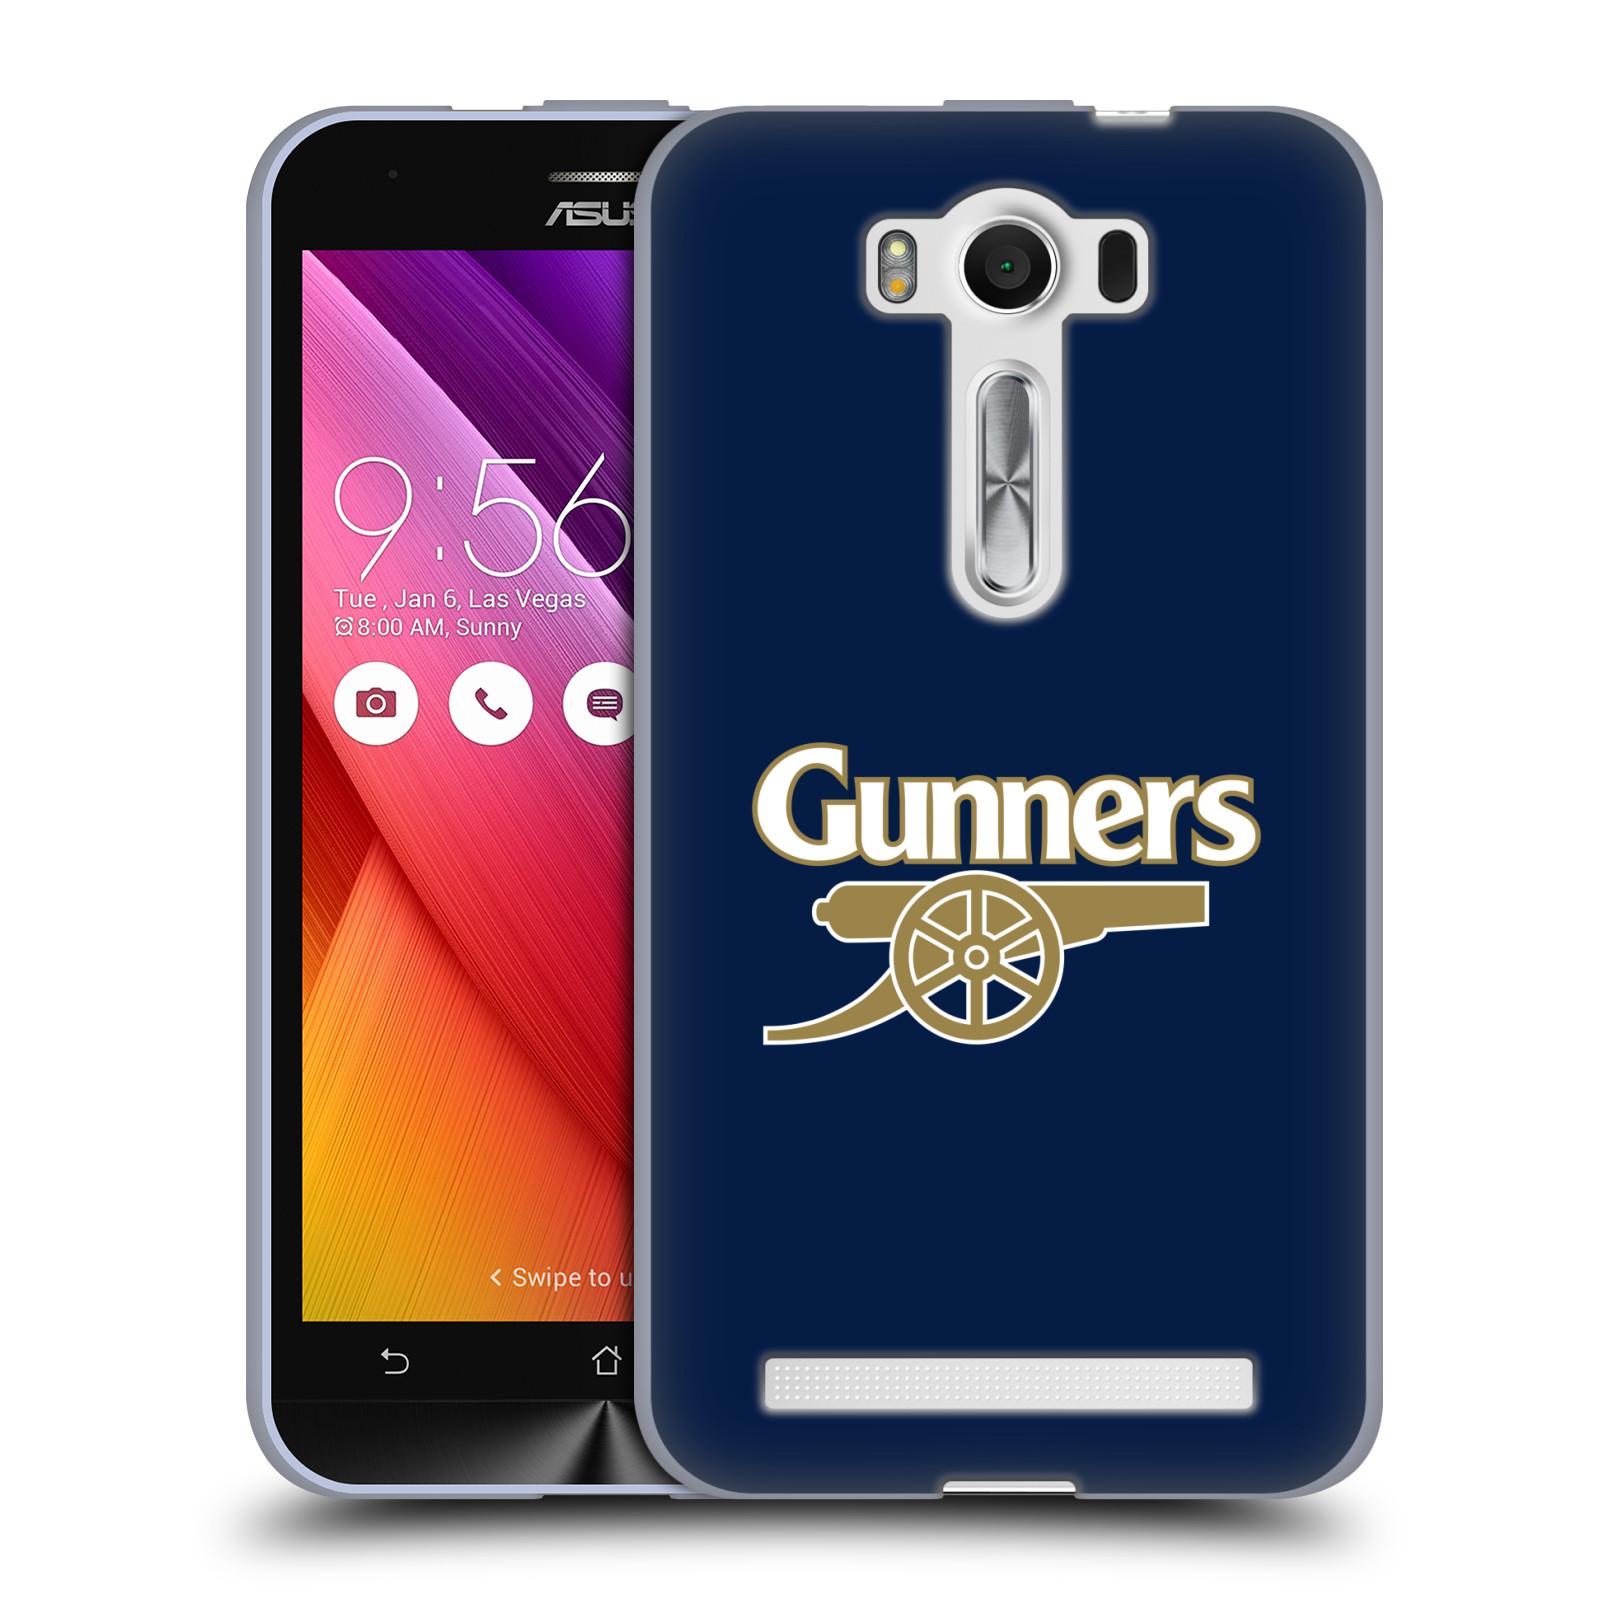 Silikonové pouzdro na mobil Asus ZenFone 2 Laser ZE500KL - Head Case - Arsenal FC - Gunners